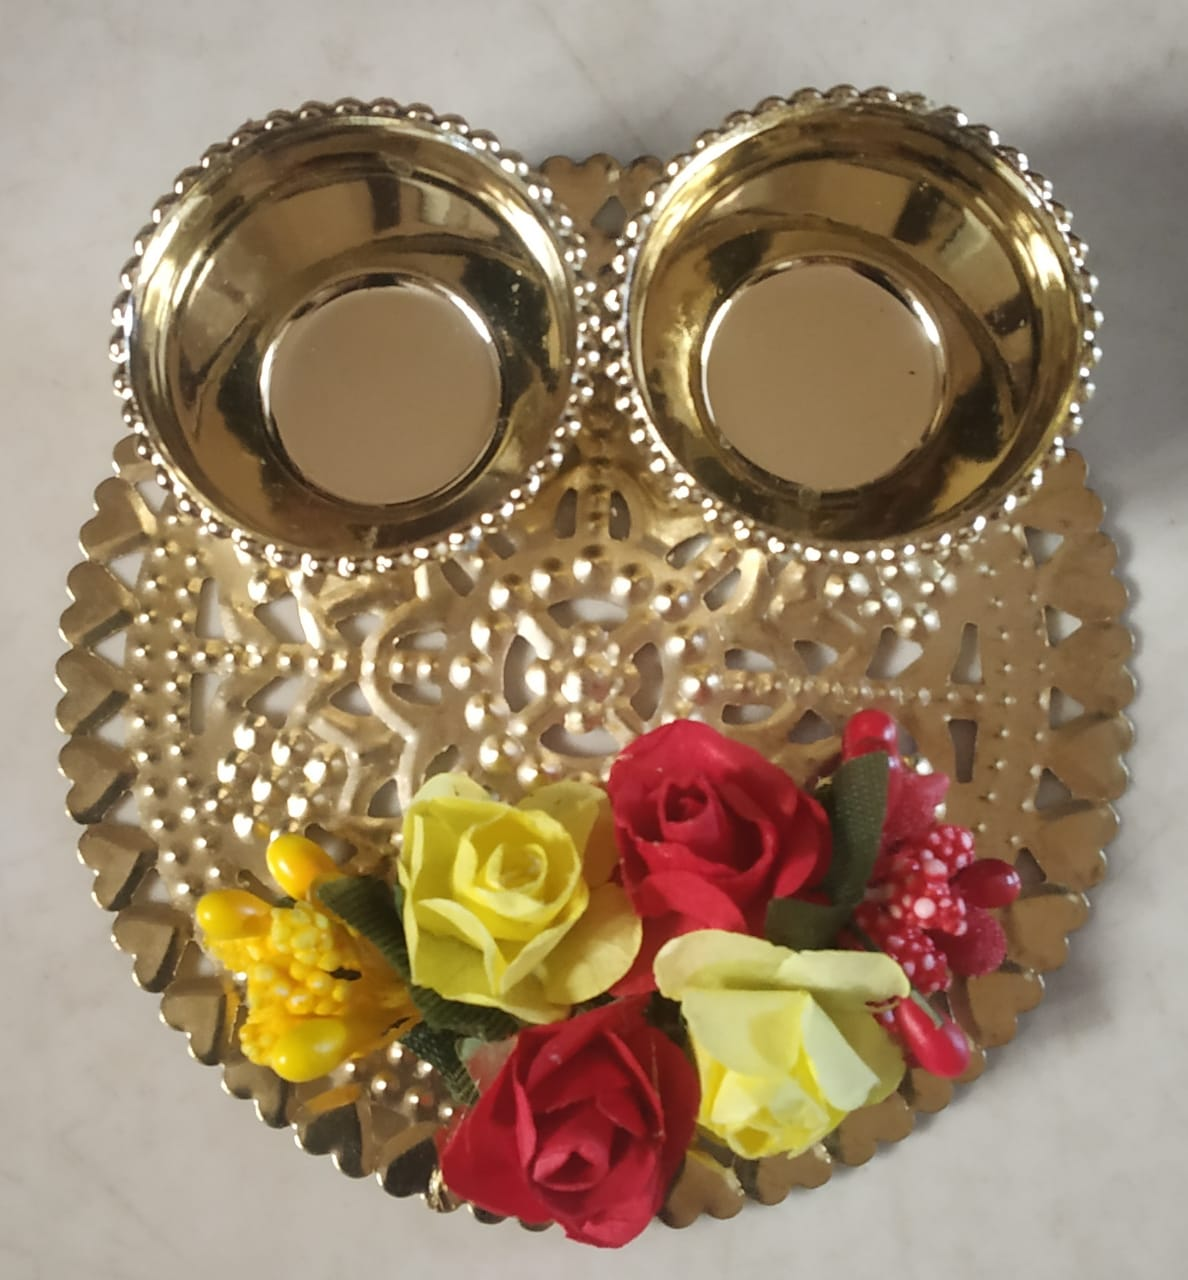 Decorative Kankavati (Roli & Chawal Platter) (Set of 2) Slider Thumbnail 1/1